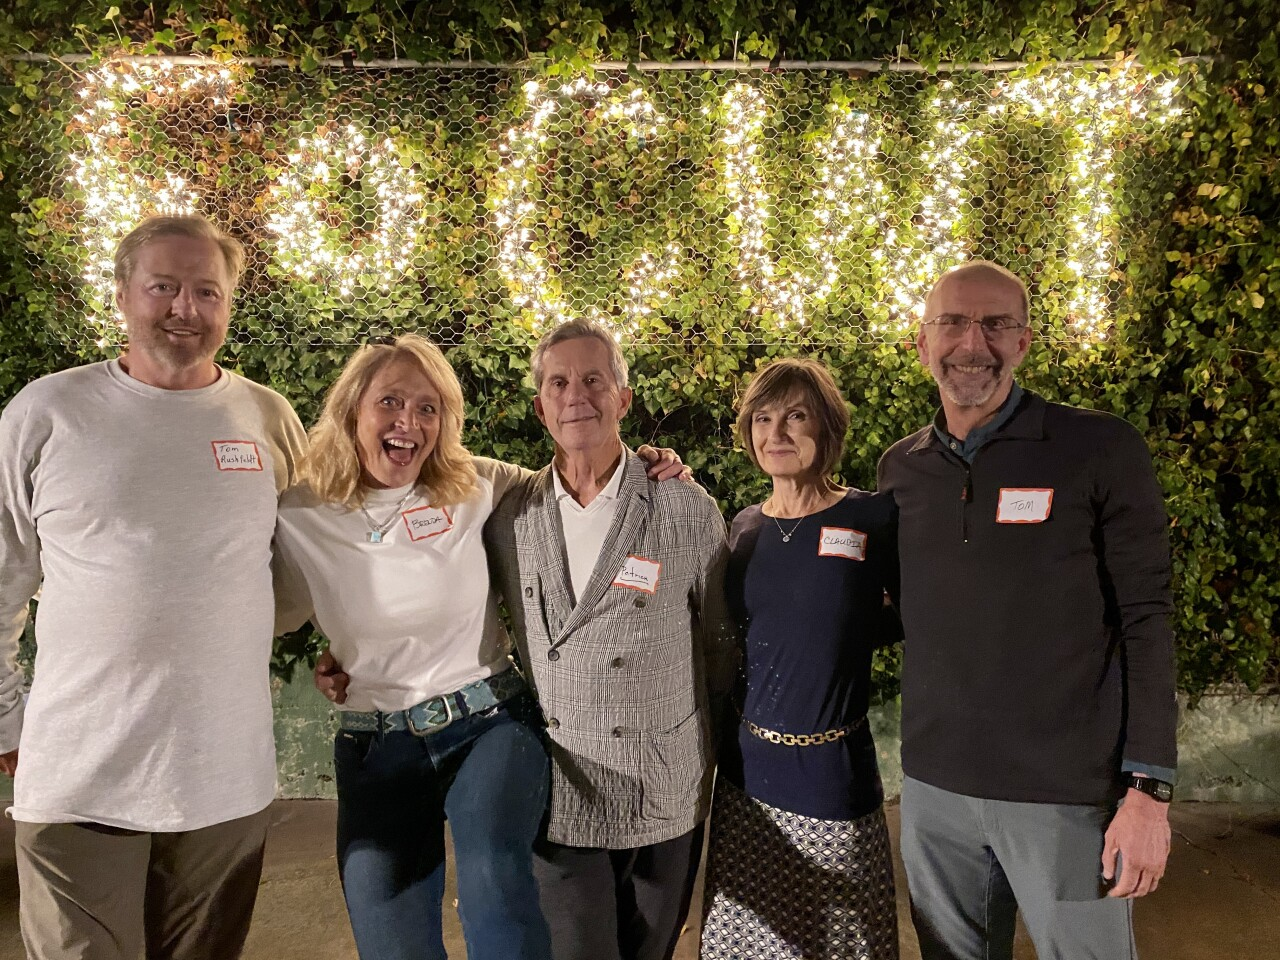 Tom Rushfeldt, Brenda Fake, Patrick Ahern, Claudia Baranowski and Tom Horvath